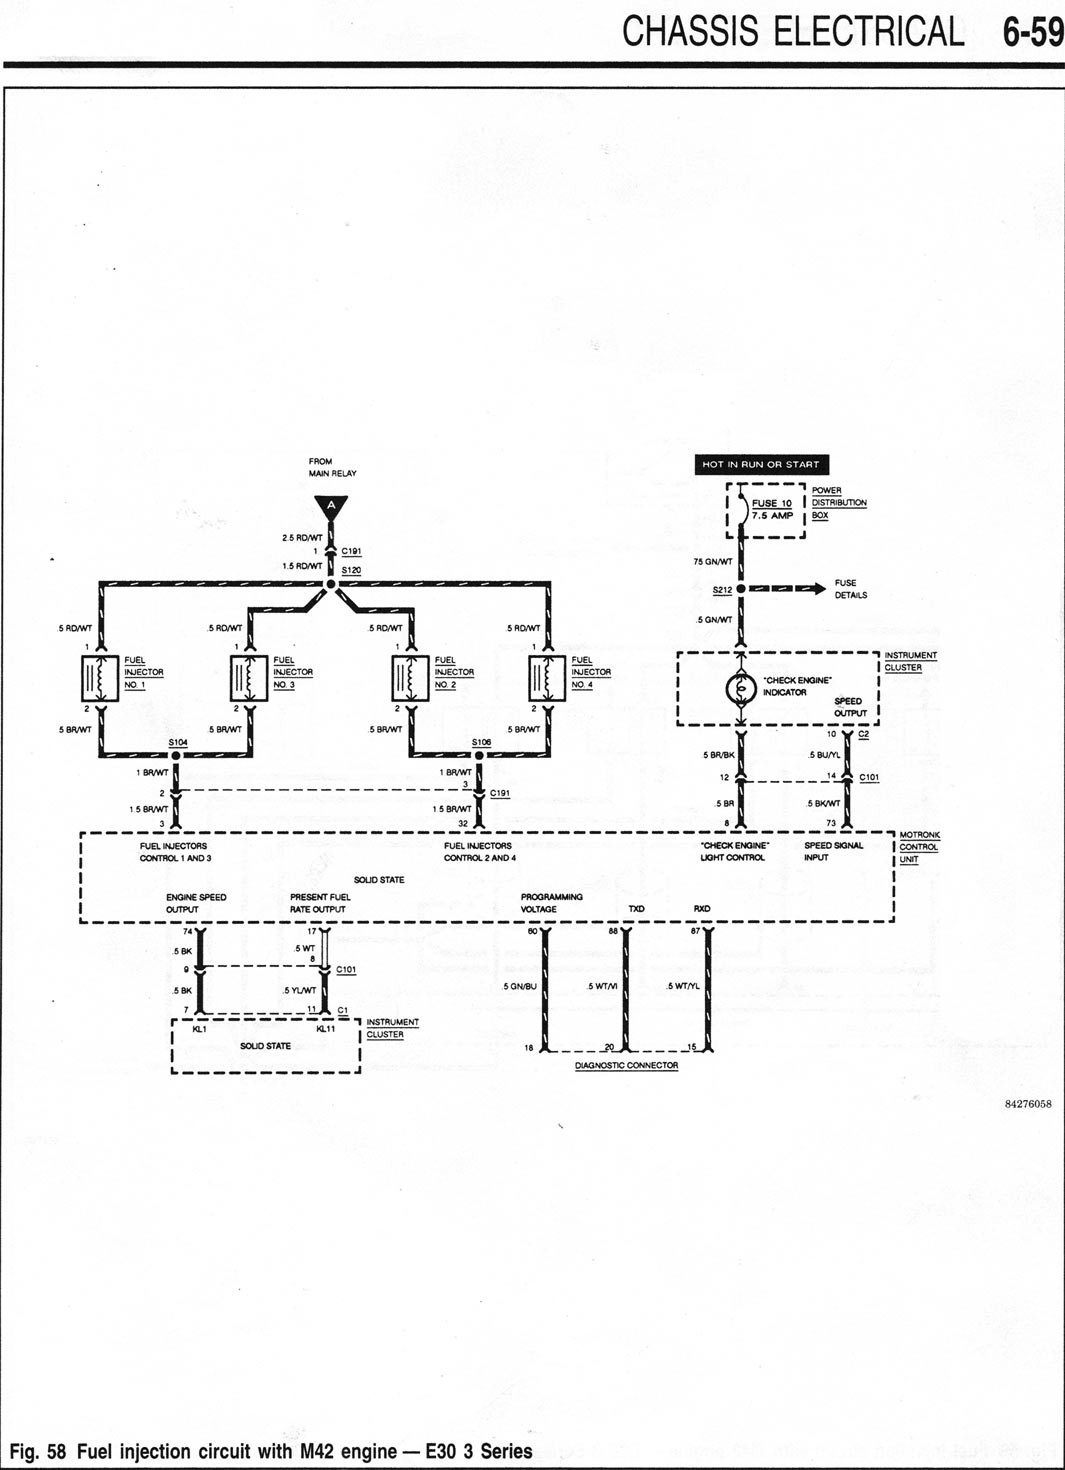 2002 bmw 325i wiring